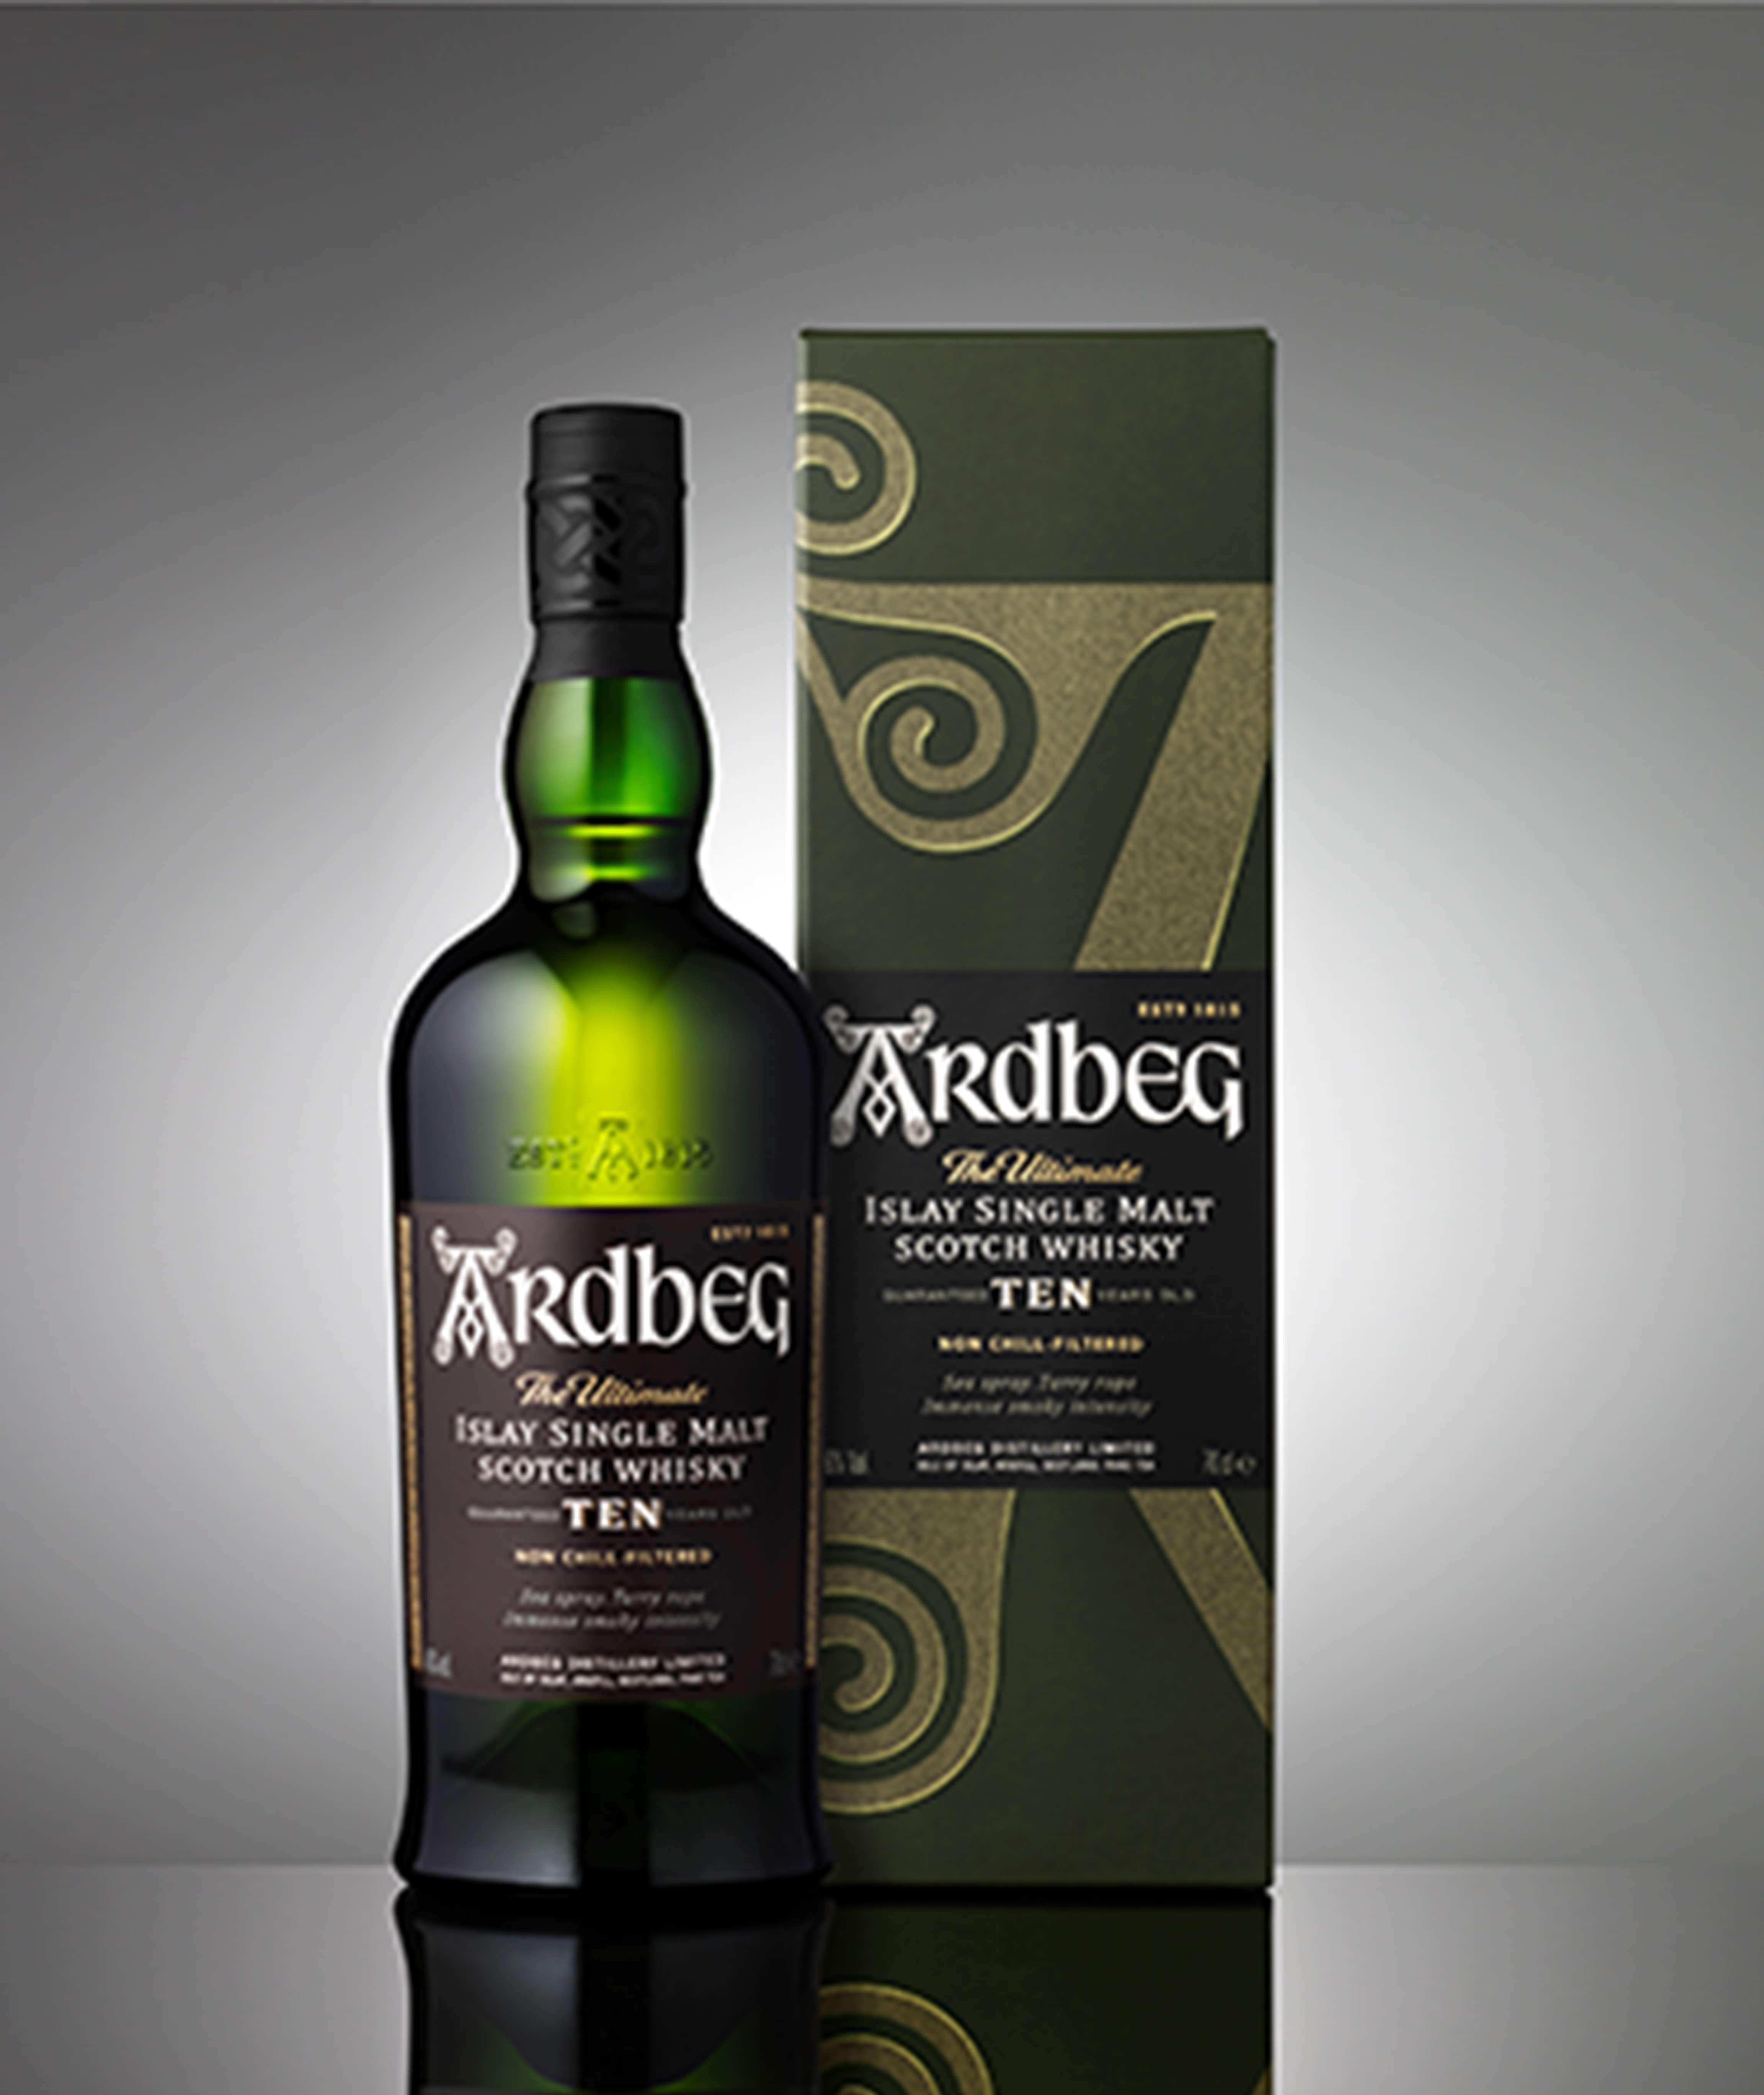 Ardbeg Single Malt Whisky